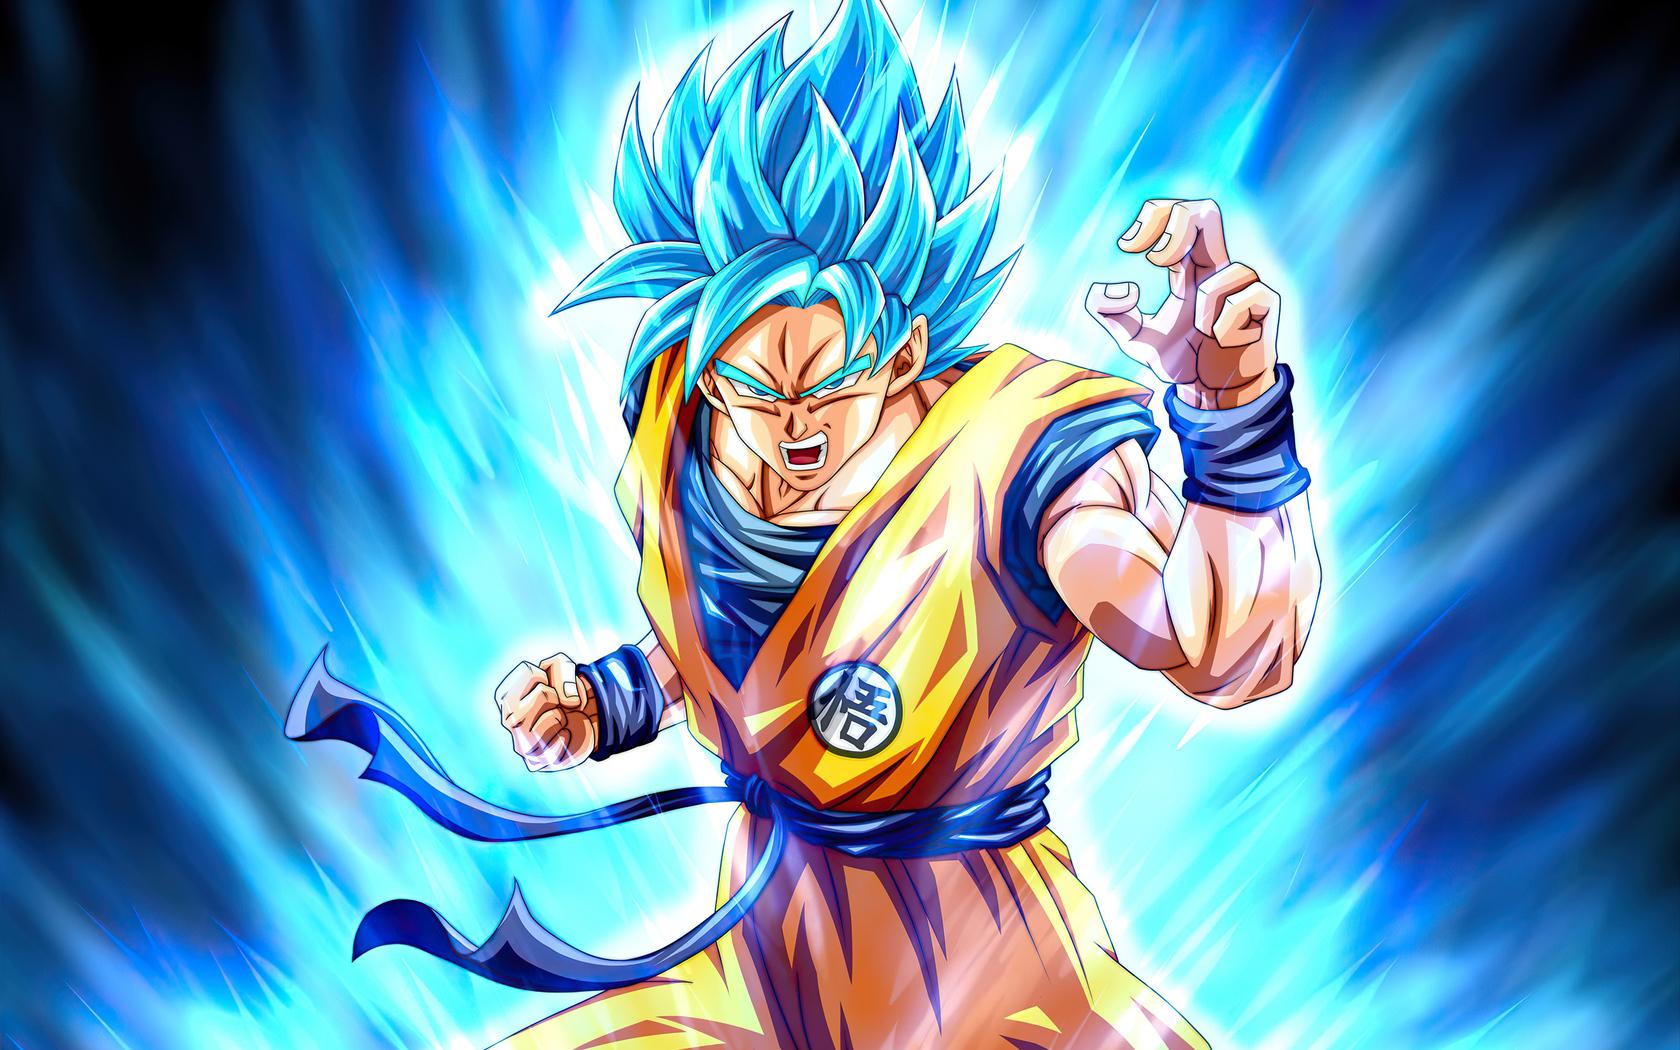 1680x1050 Dragon Ball Son Goku 4k 1680x1050 Resolution HD ...